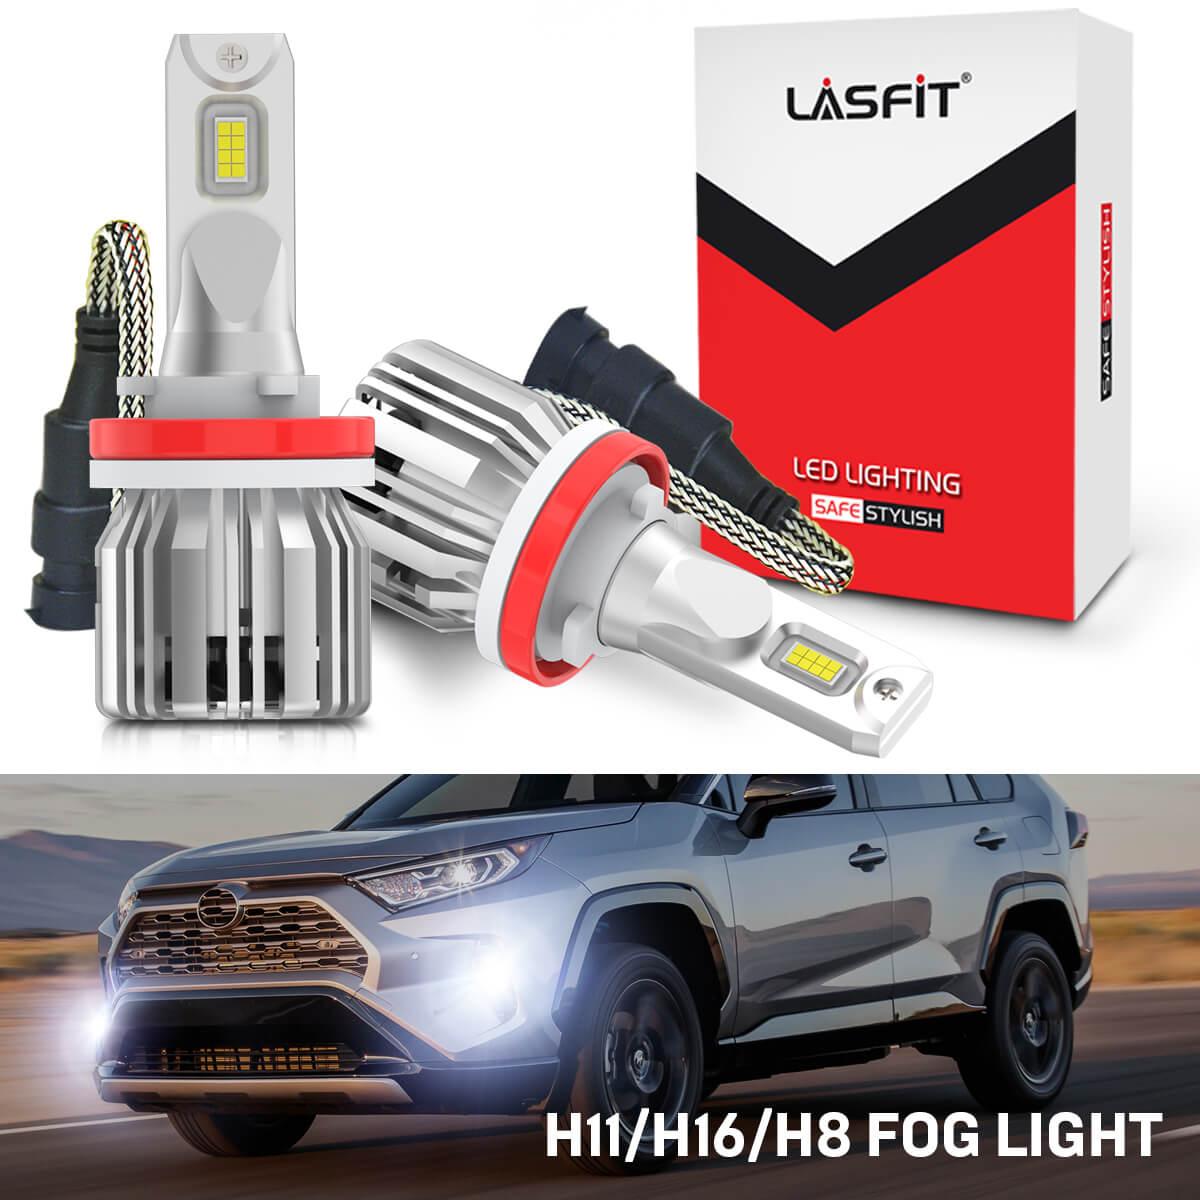 Cree H16 LED Fog Light for Toyota Tundra 2014-2019 RAV4 2013-2019 Tacoma 16-2019